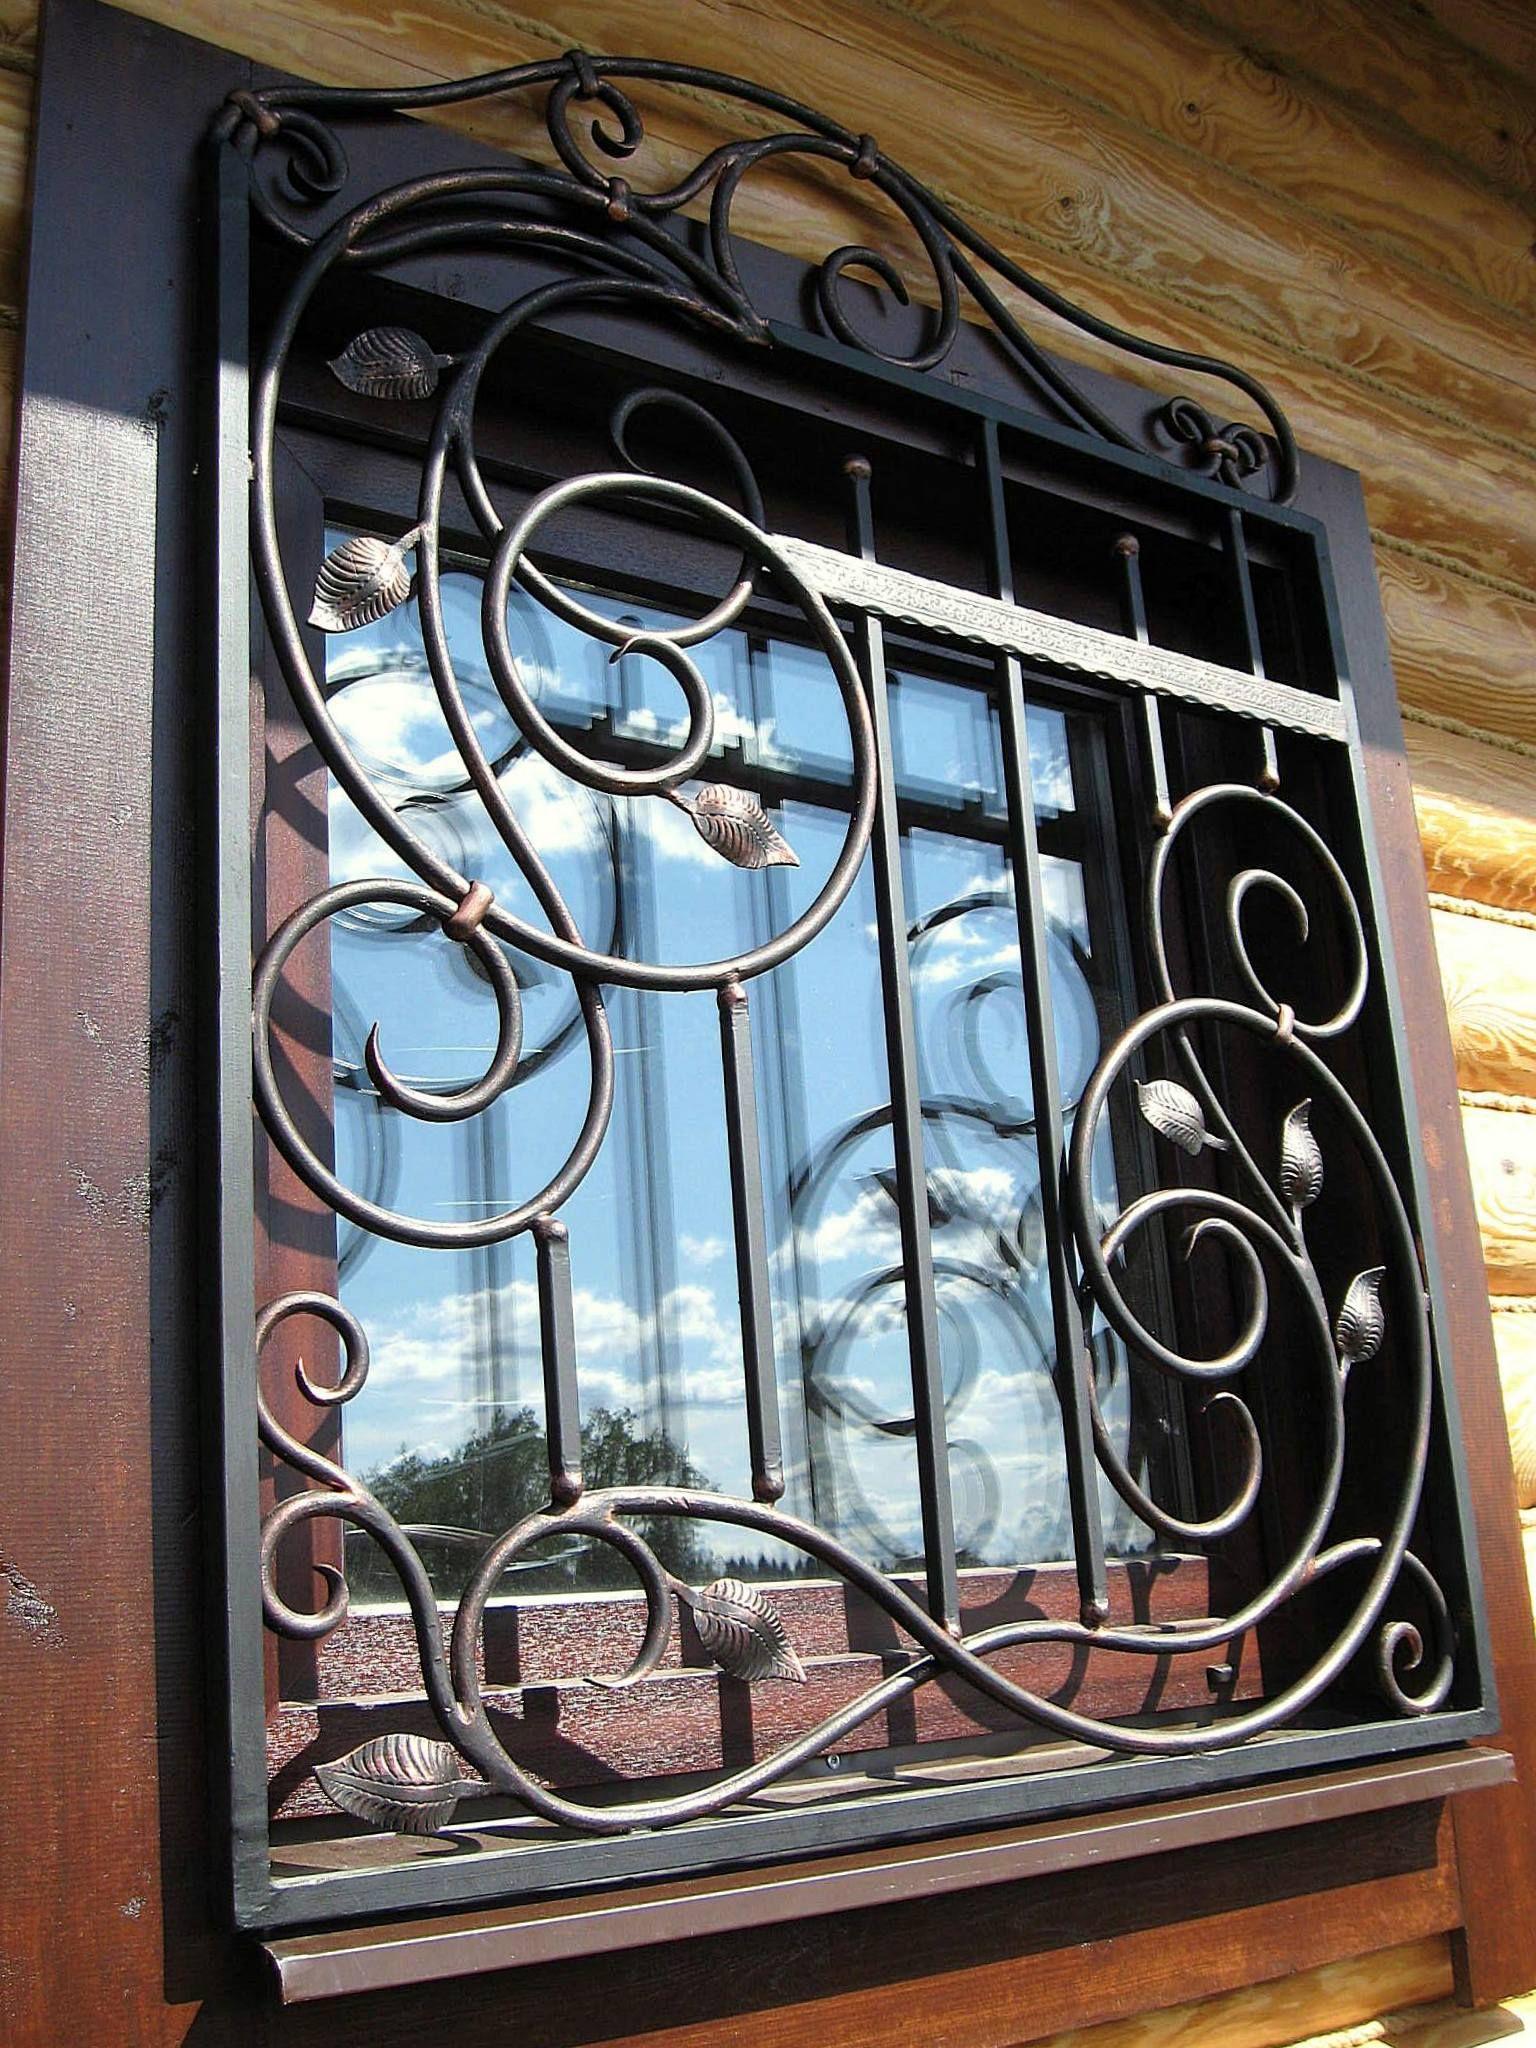 metal gates wrought iron decor window grill also classical design art rh pinterest